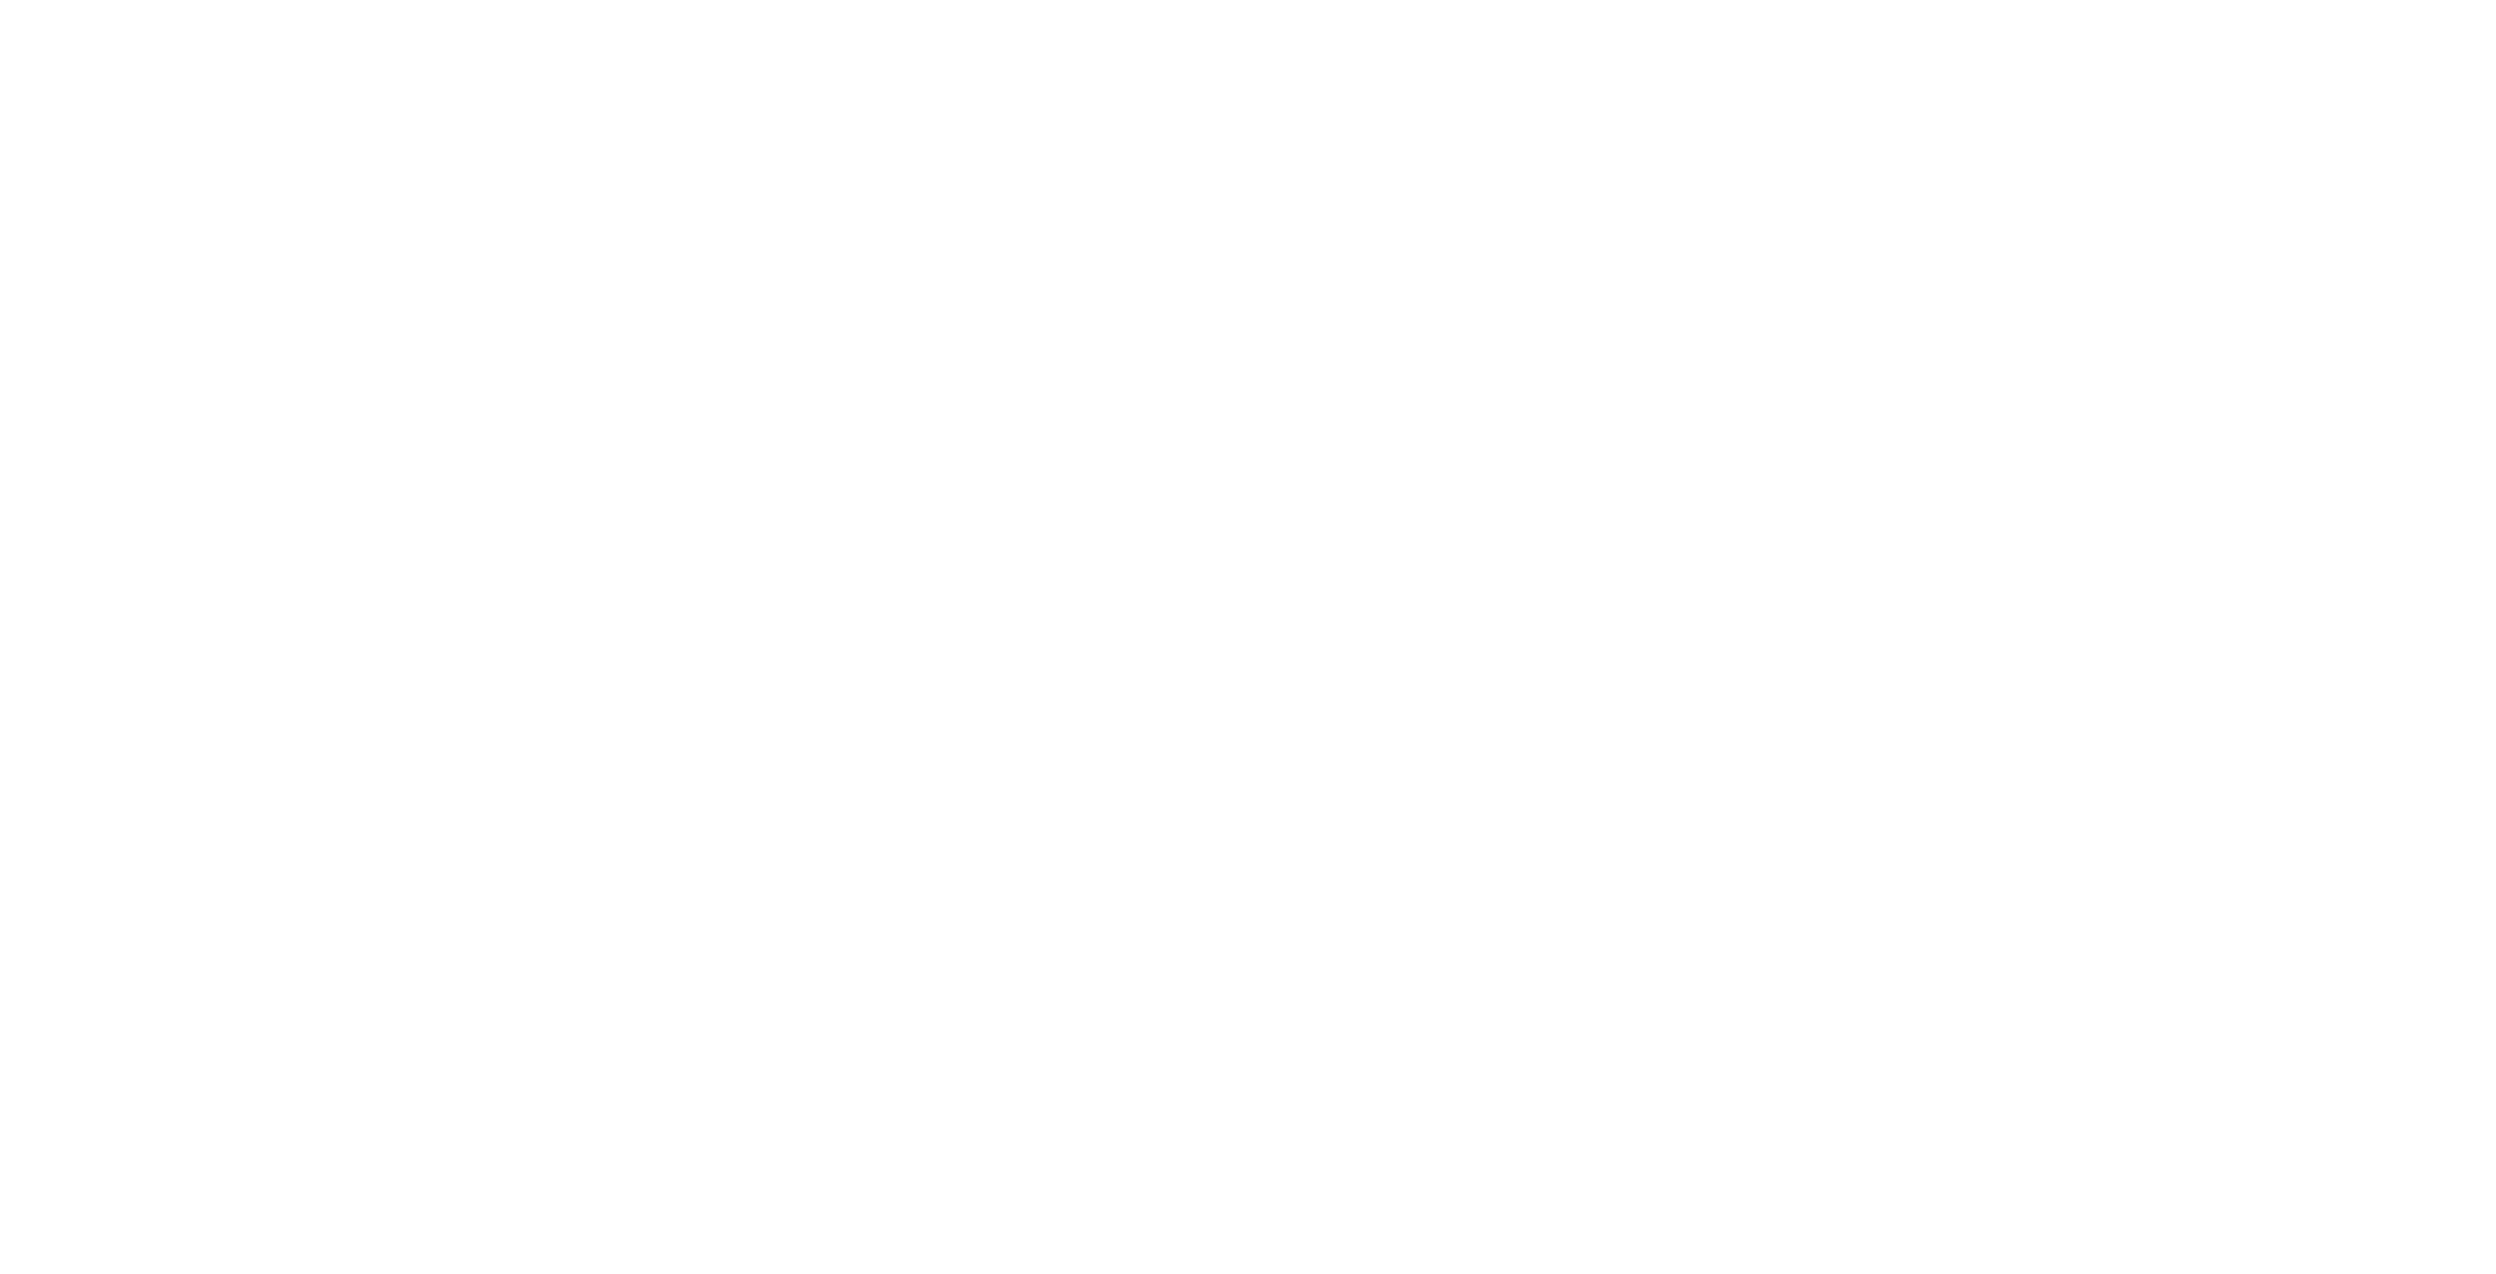 Headline_lockup_FA_wht